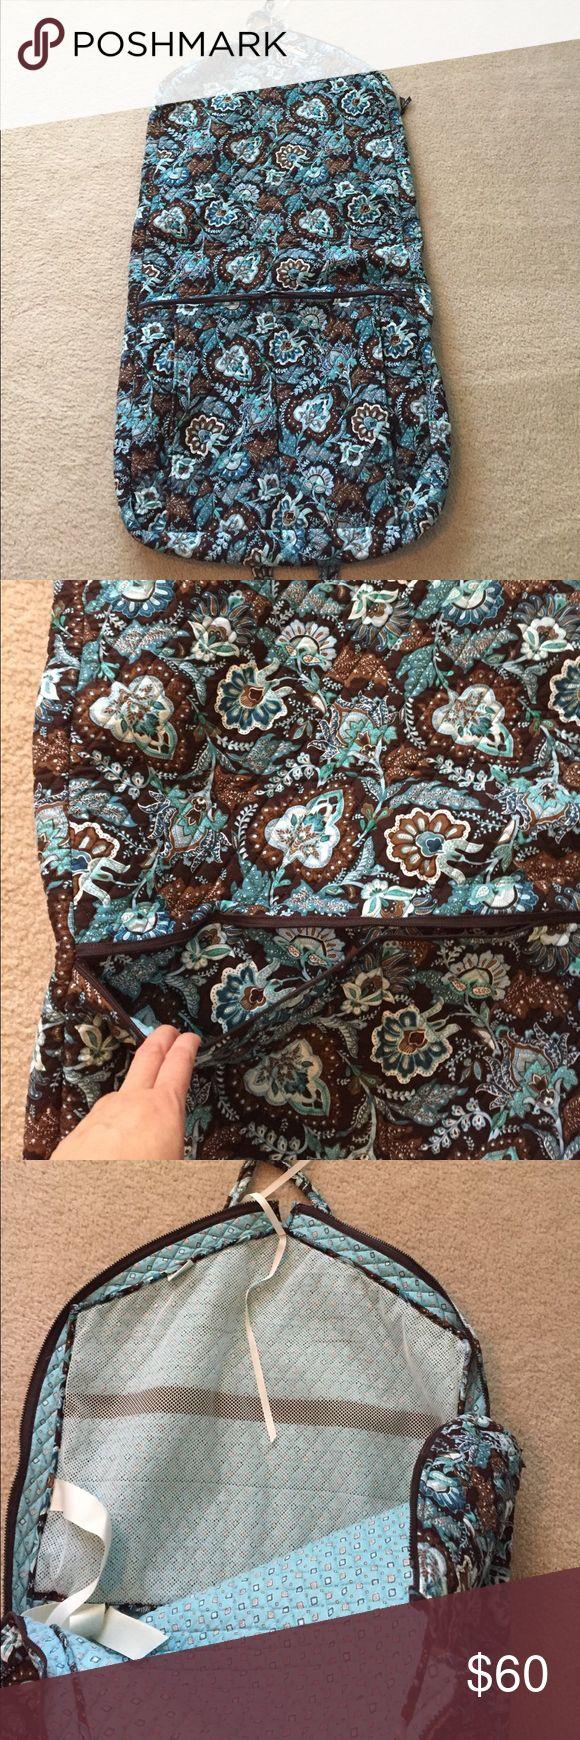 Like New Condition Java Blue Garment Bag Used very few times. Vera Bradley garment bag. Didn't find any flaws! Vera Bradley Bags